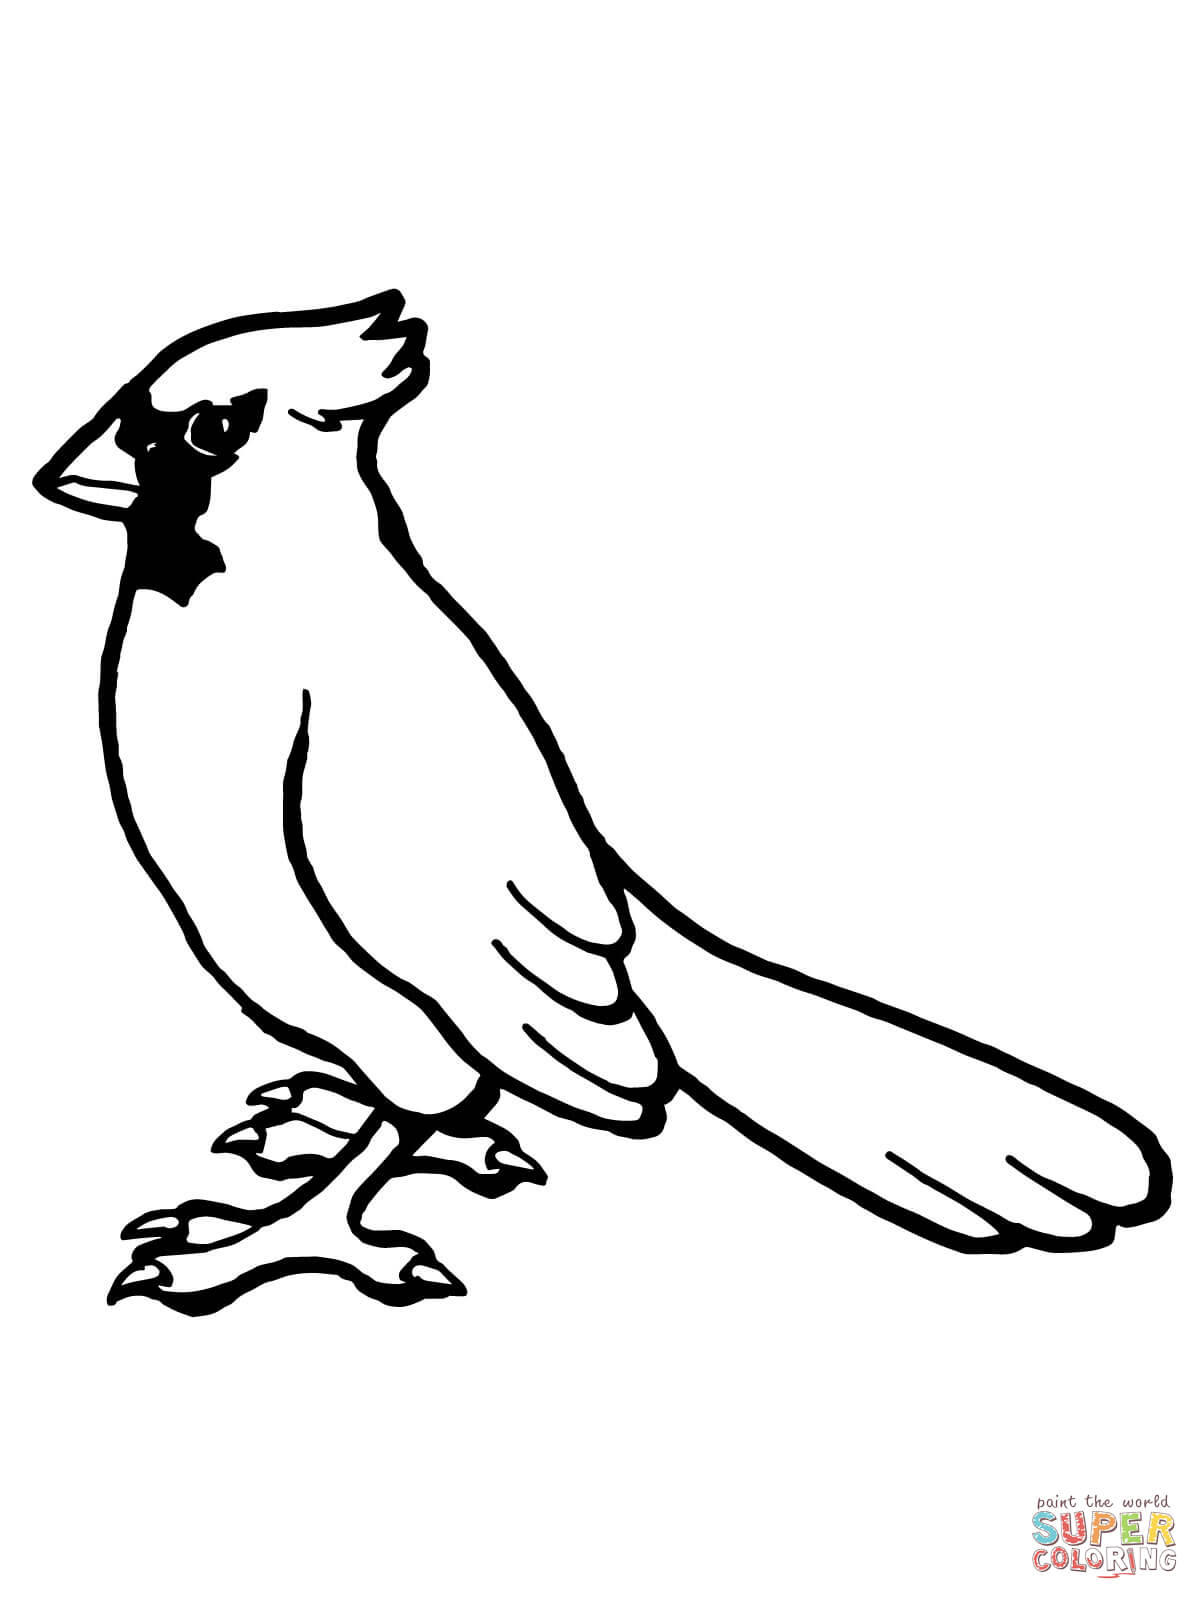 Nothern Cardinal Bird Coloring Page